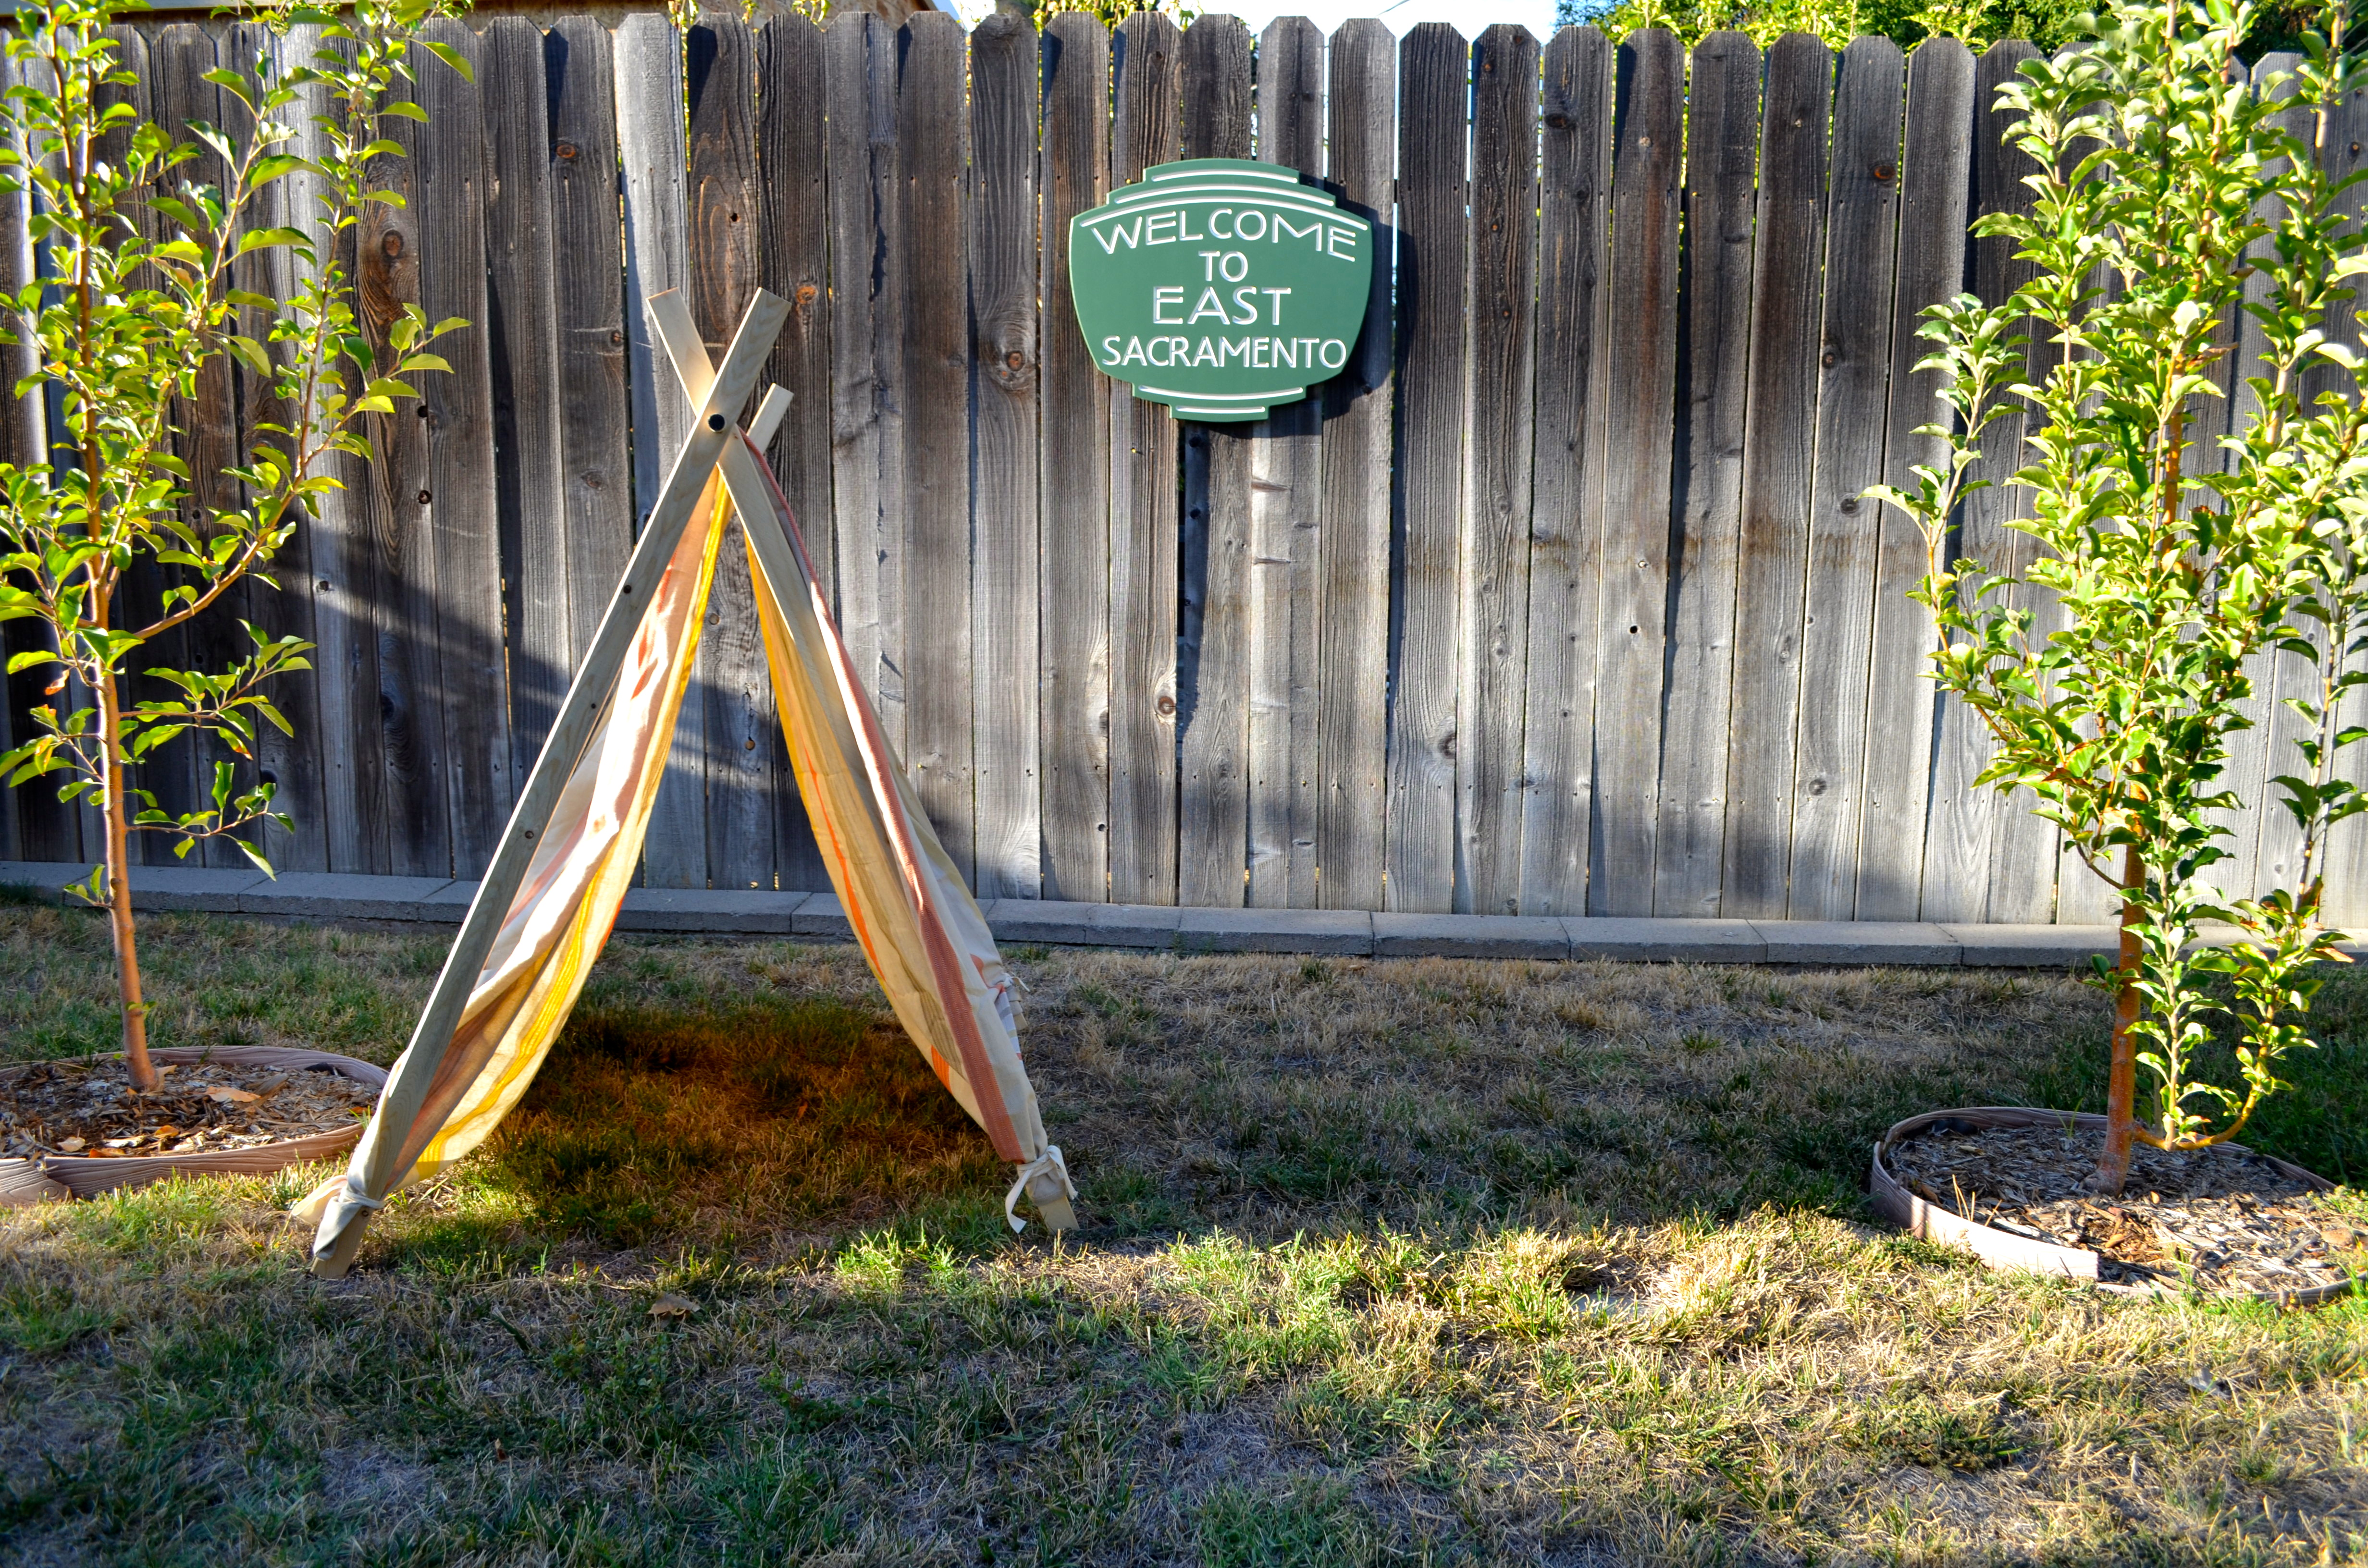 DSC_2834 & DIY A-frame tent | East Sac Edible